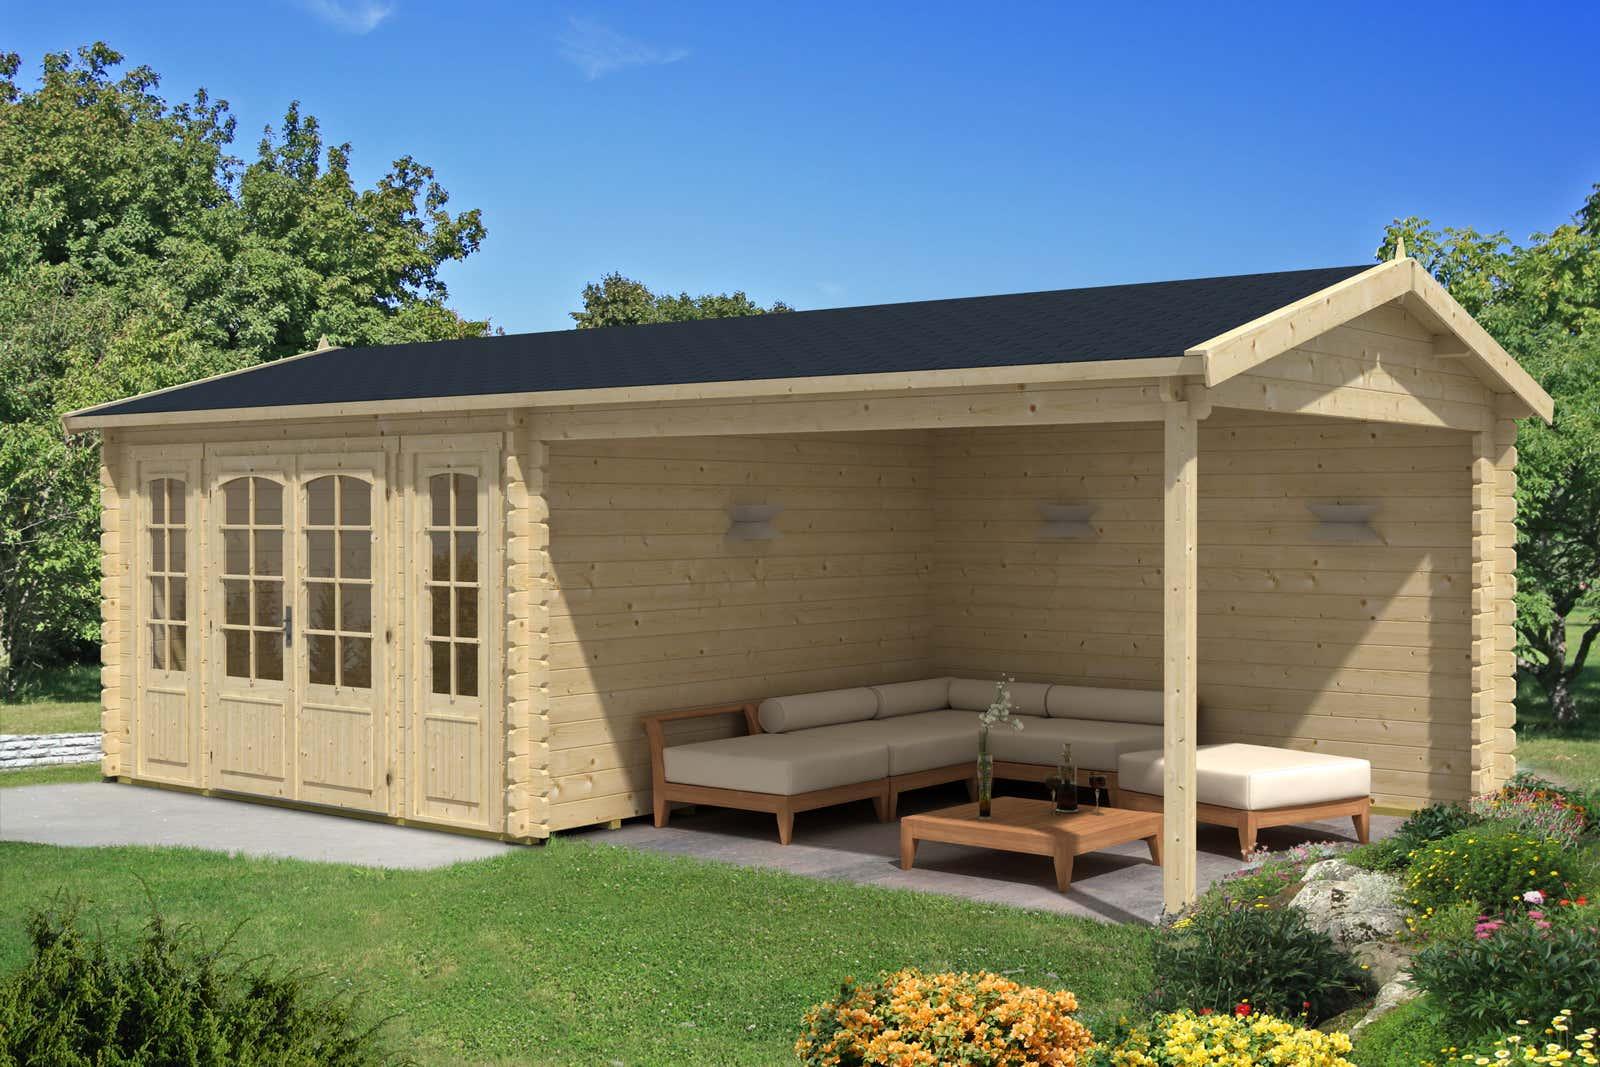 gartenholzhaus mit 40 44 mm wandst rke gro e auswahl. Black Bedroom Furniture Sets. Home Design Ideas